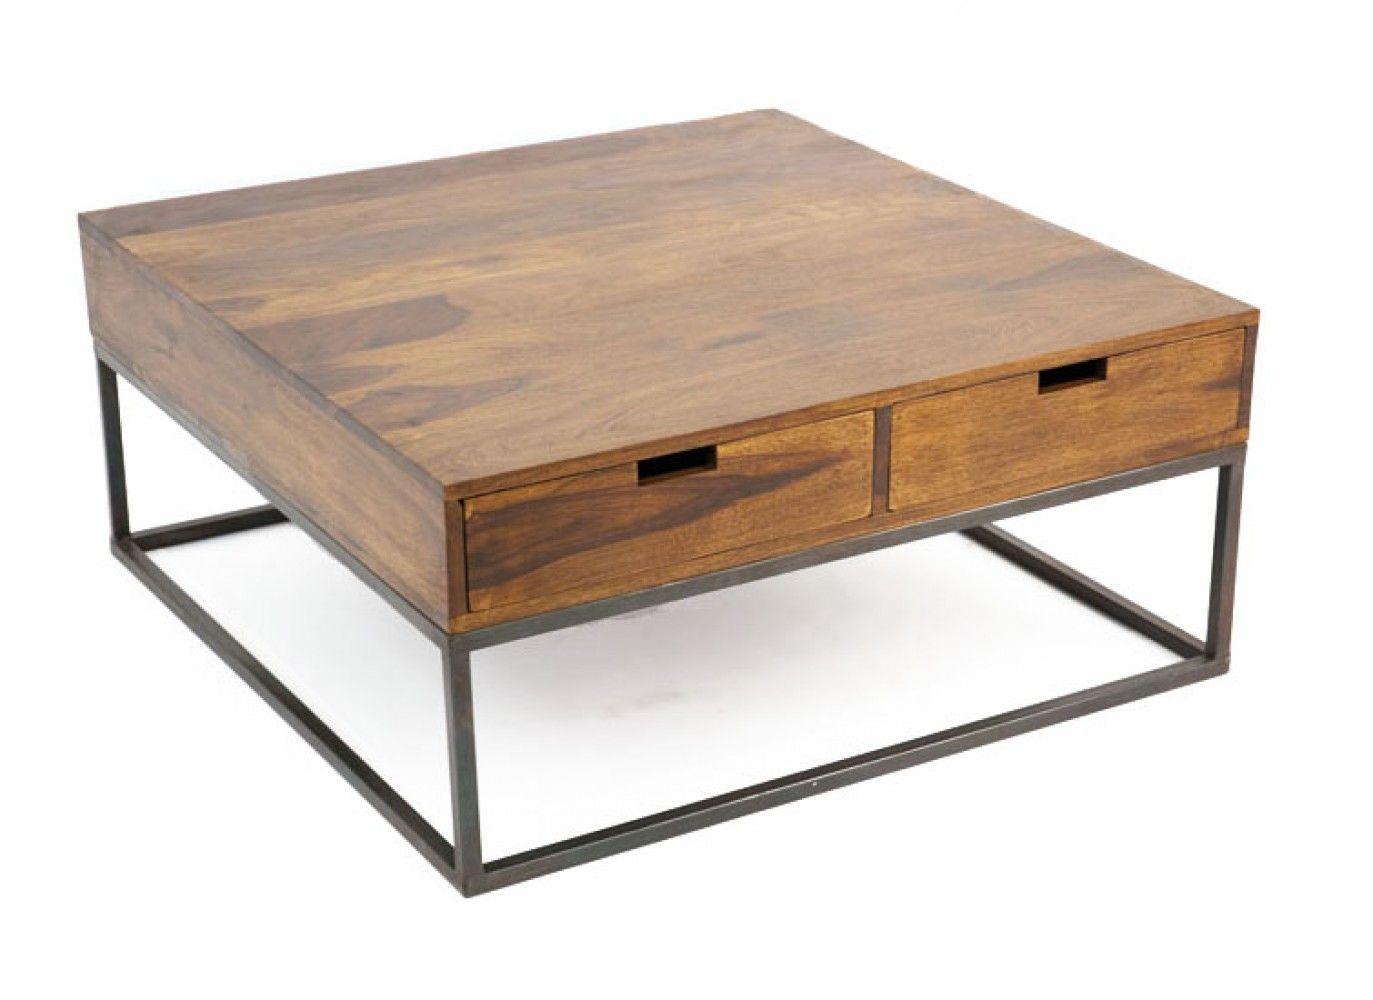 table basse design industriel 4 tiroirs bois et fer crispy